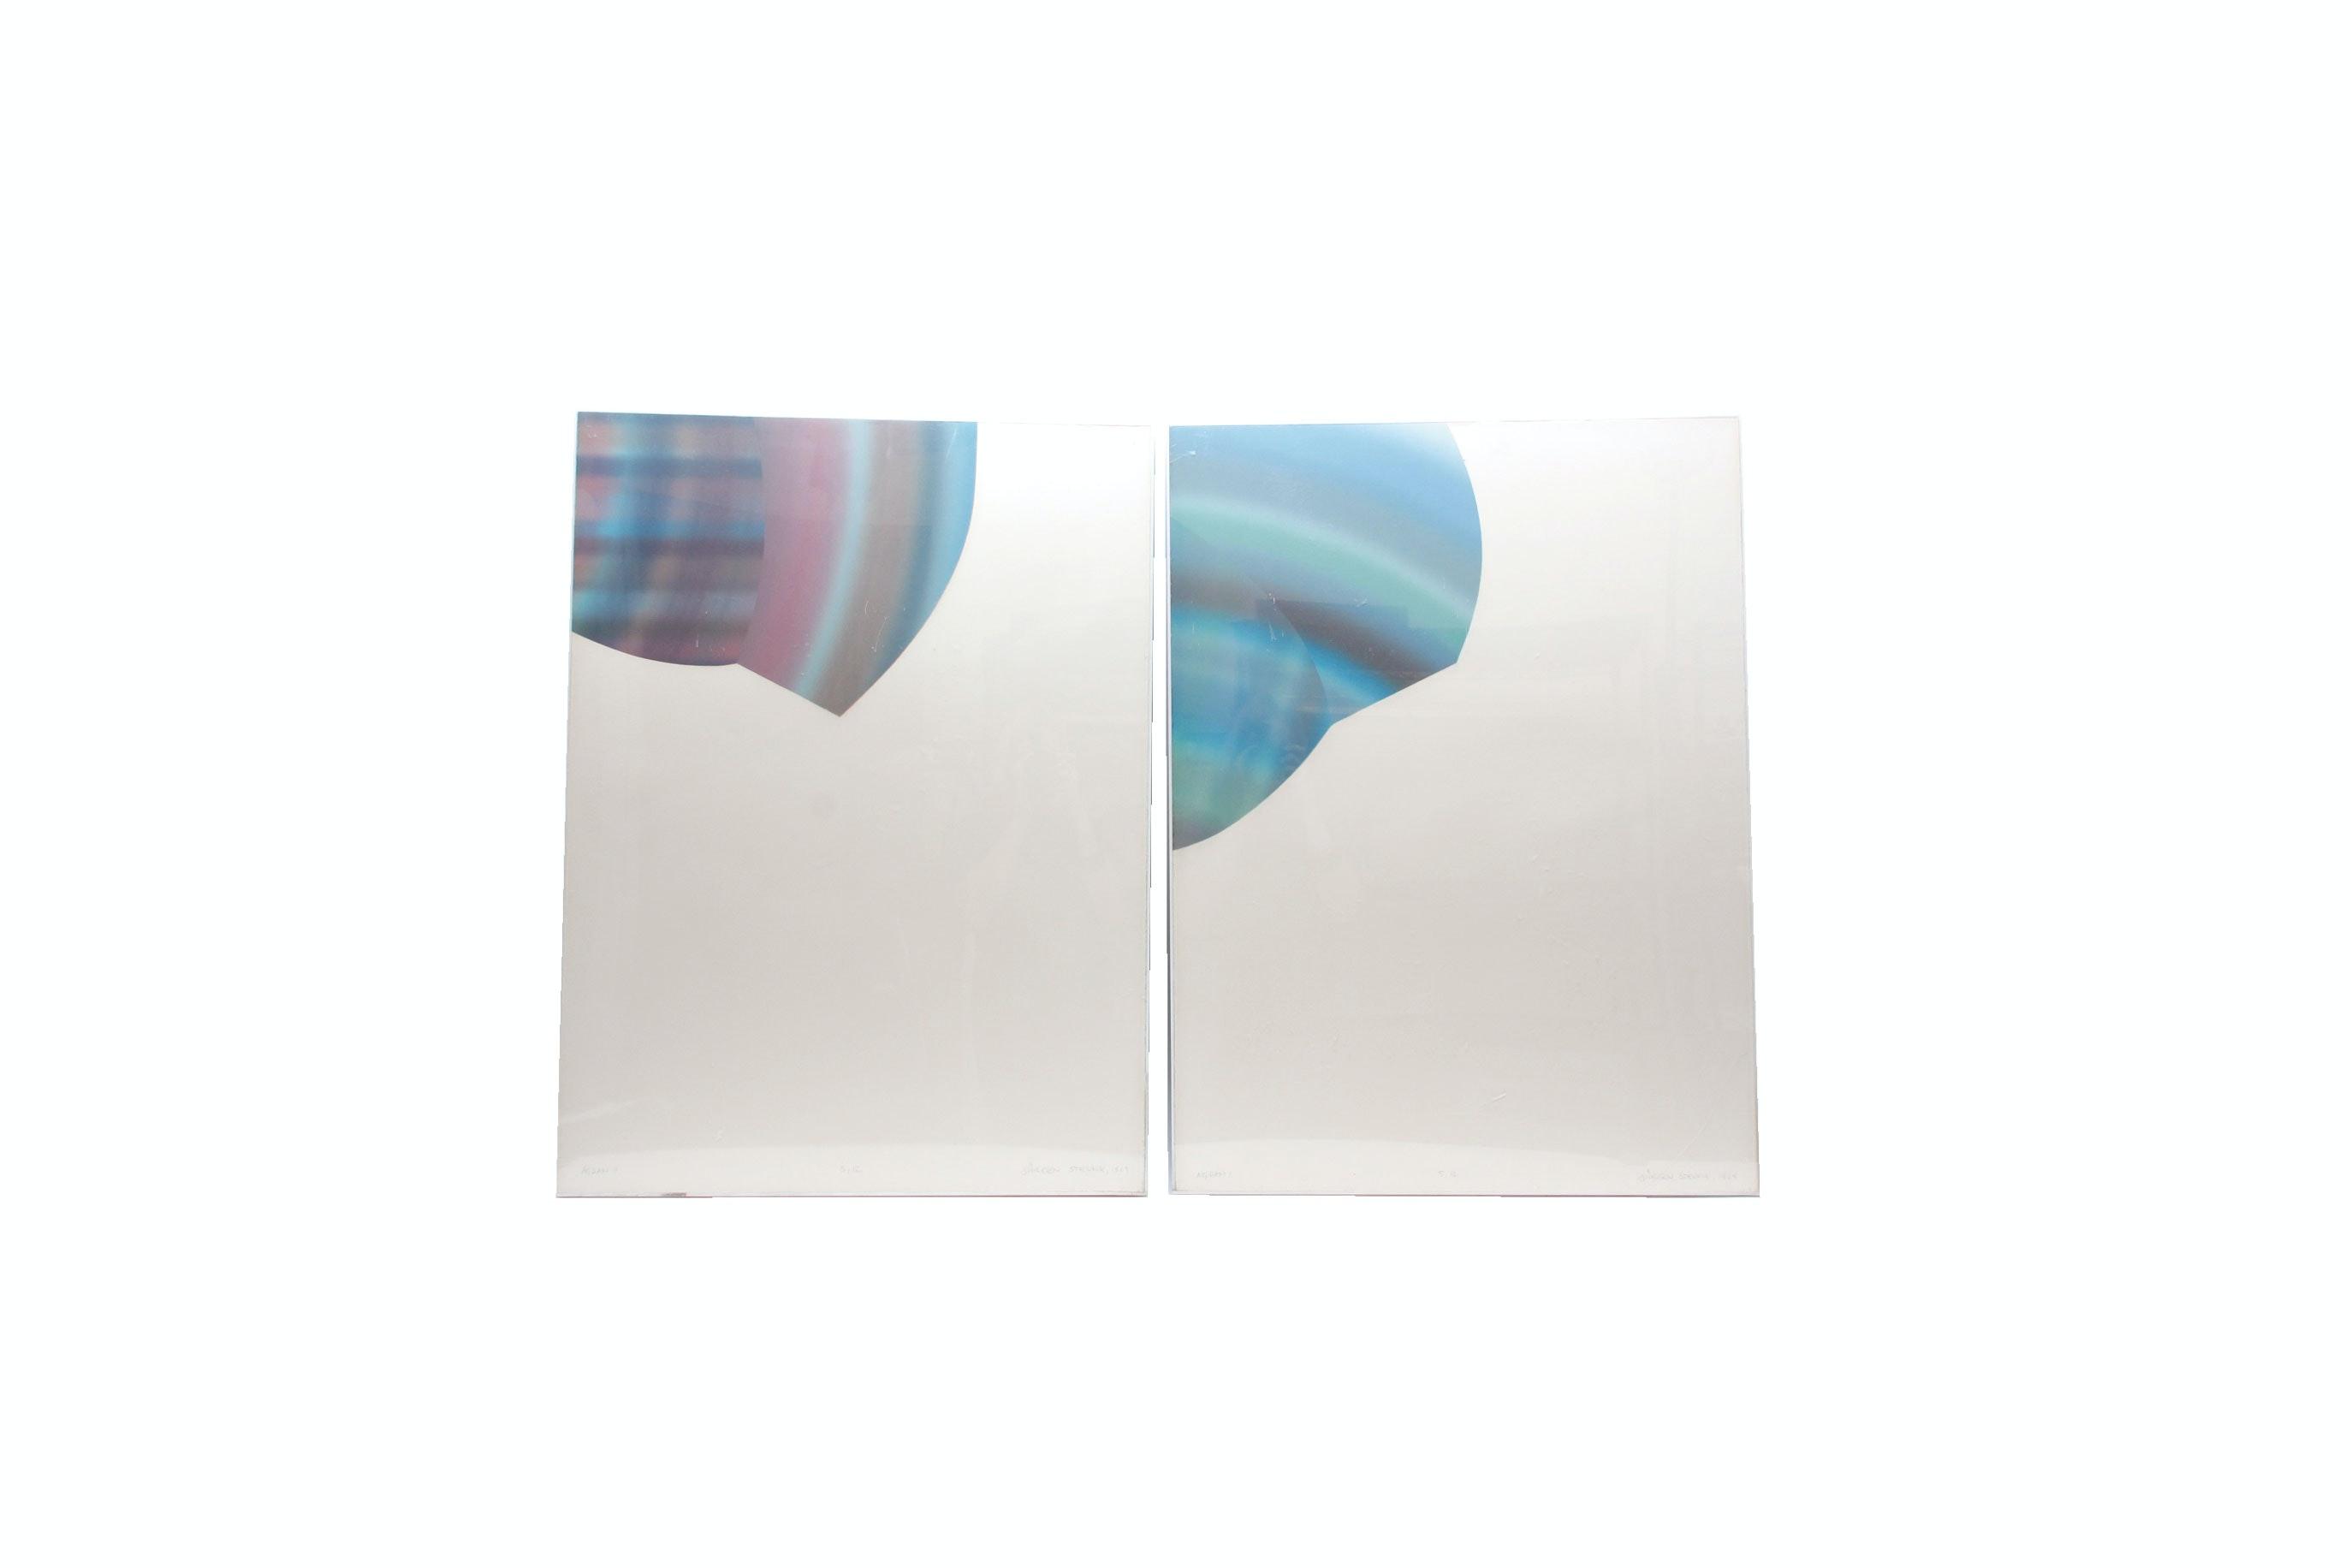 Jurgen Strunck Limited Edition and Signed Relief Prints